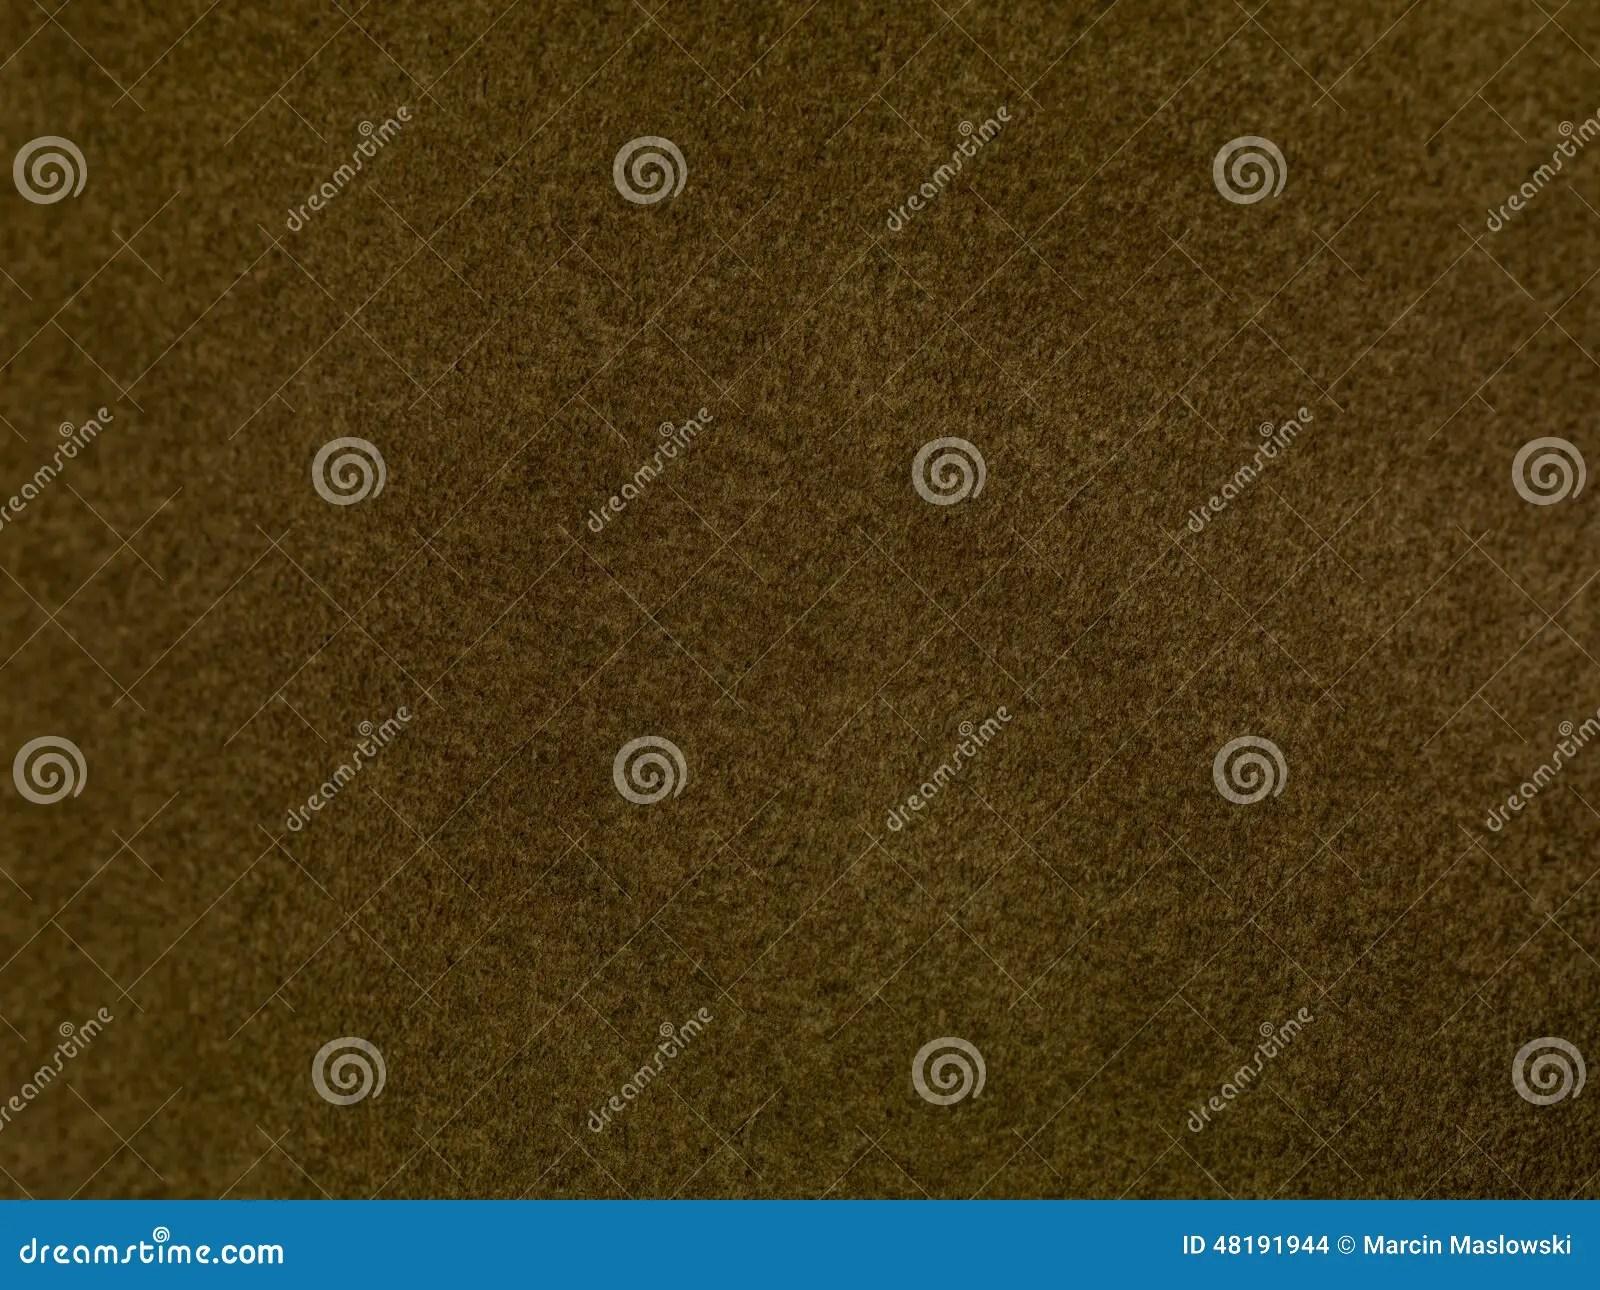 E Download Dark Green Carpet Stock Photo Image Of Decorative Curled   48191944